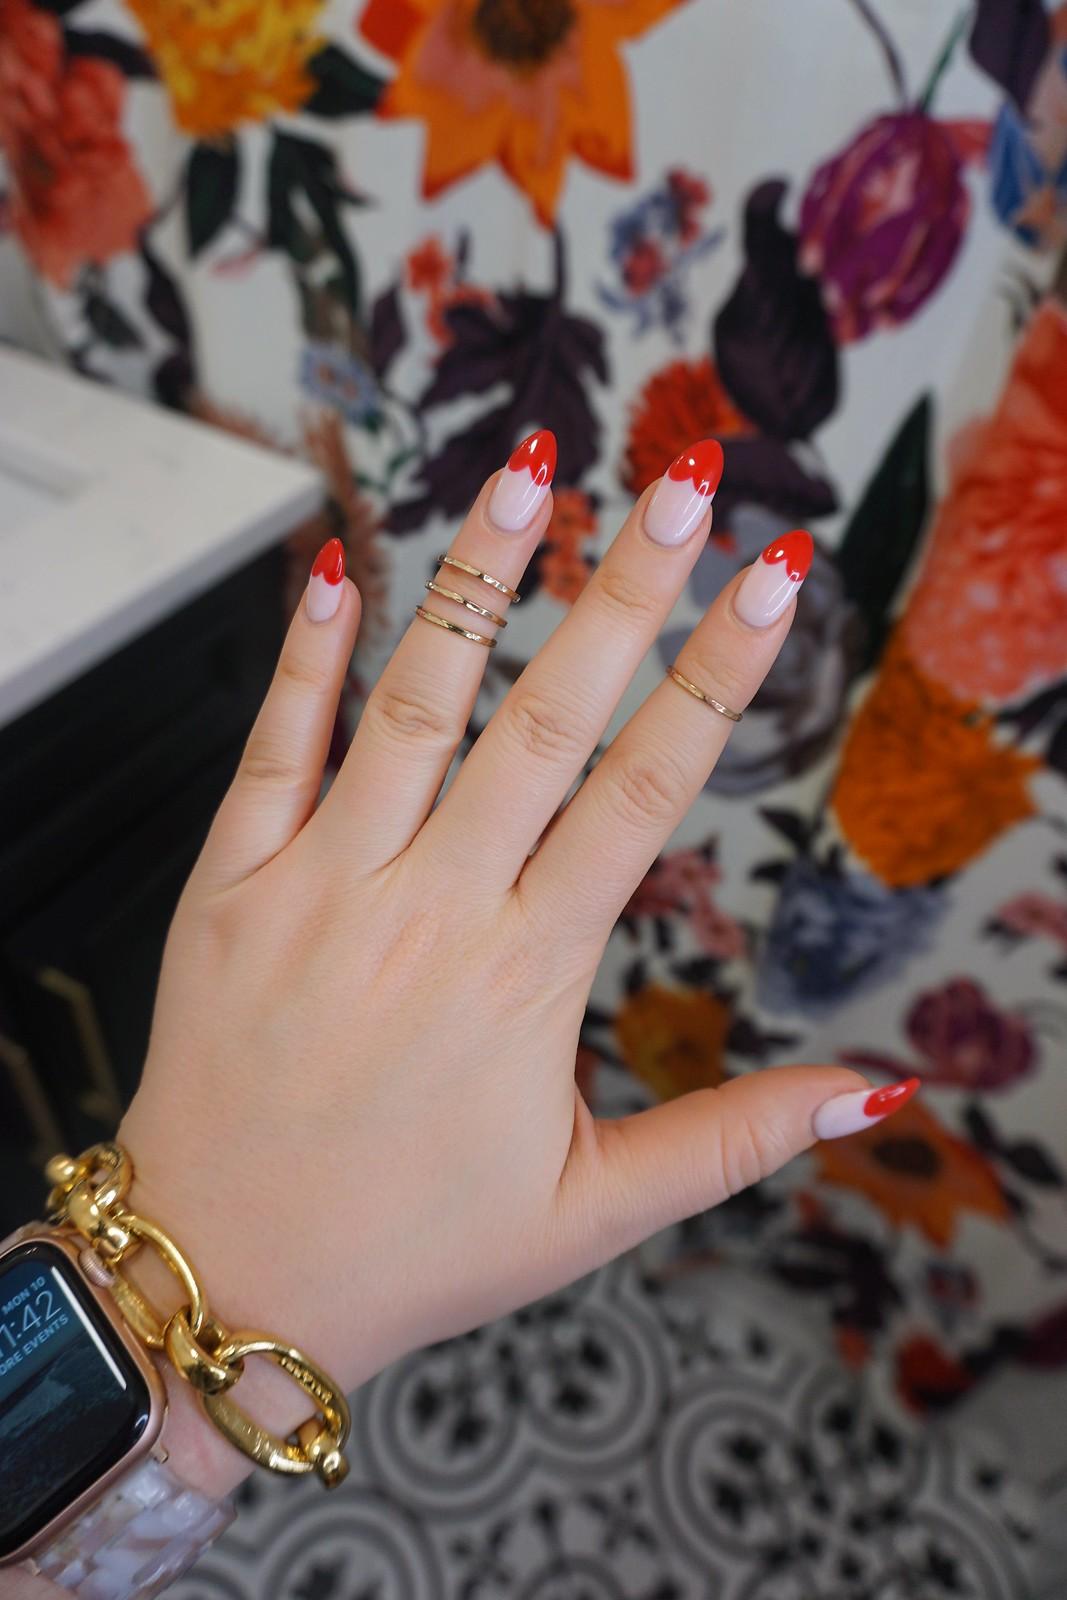 Heart Nails   Heart Manicure   Pink Red Nail Art   Valentines Day Nail Inspiration   Galentines Day Nail Art   Nail Ideas   Nail Designs   UV Nails   Hard Gel Manicure